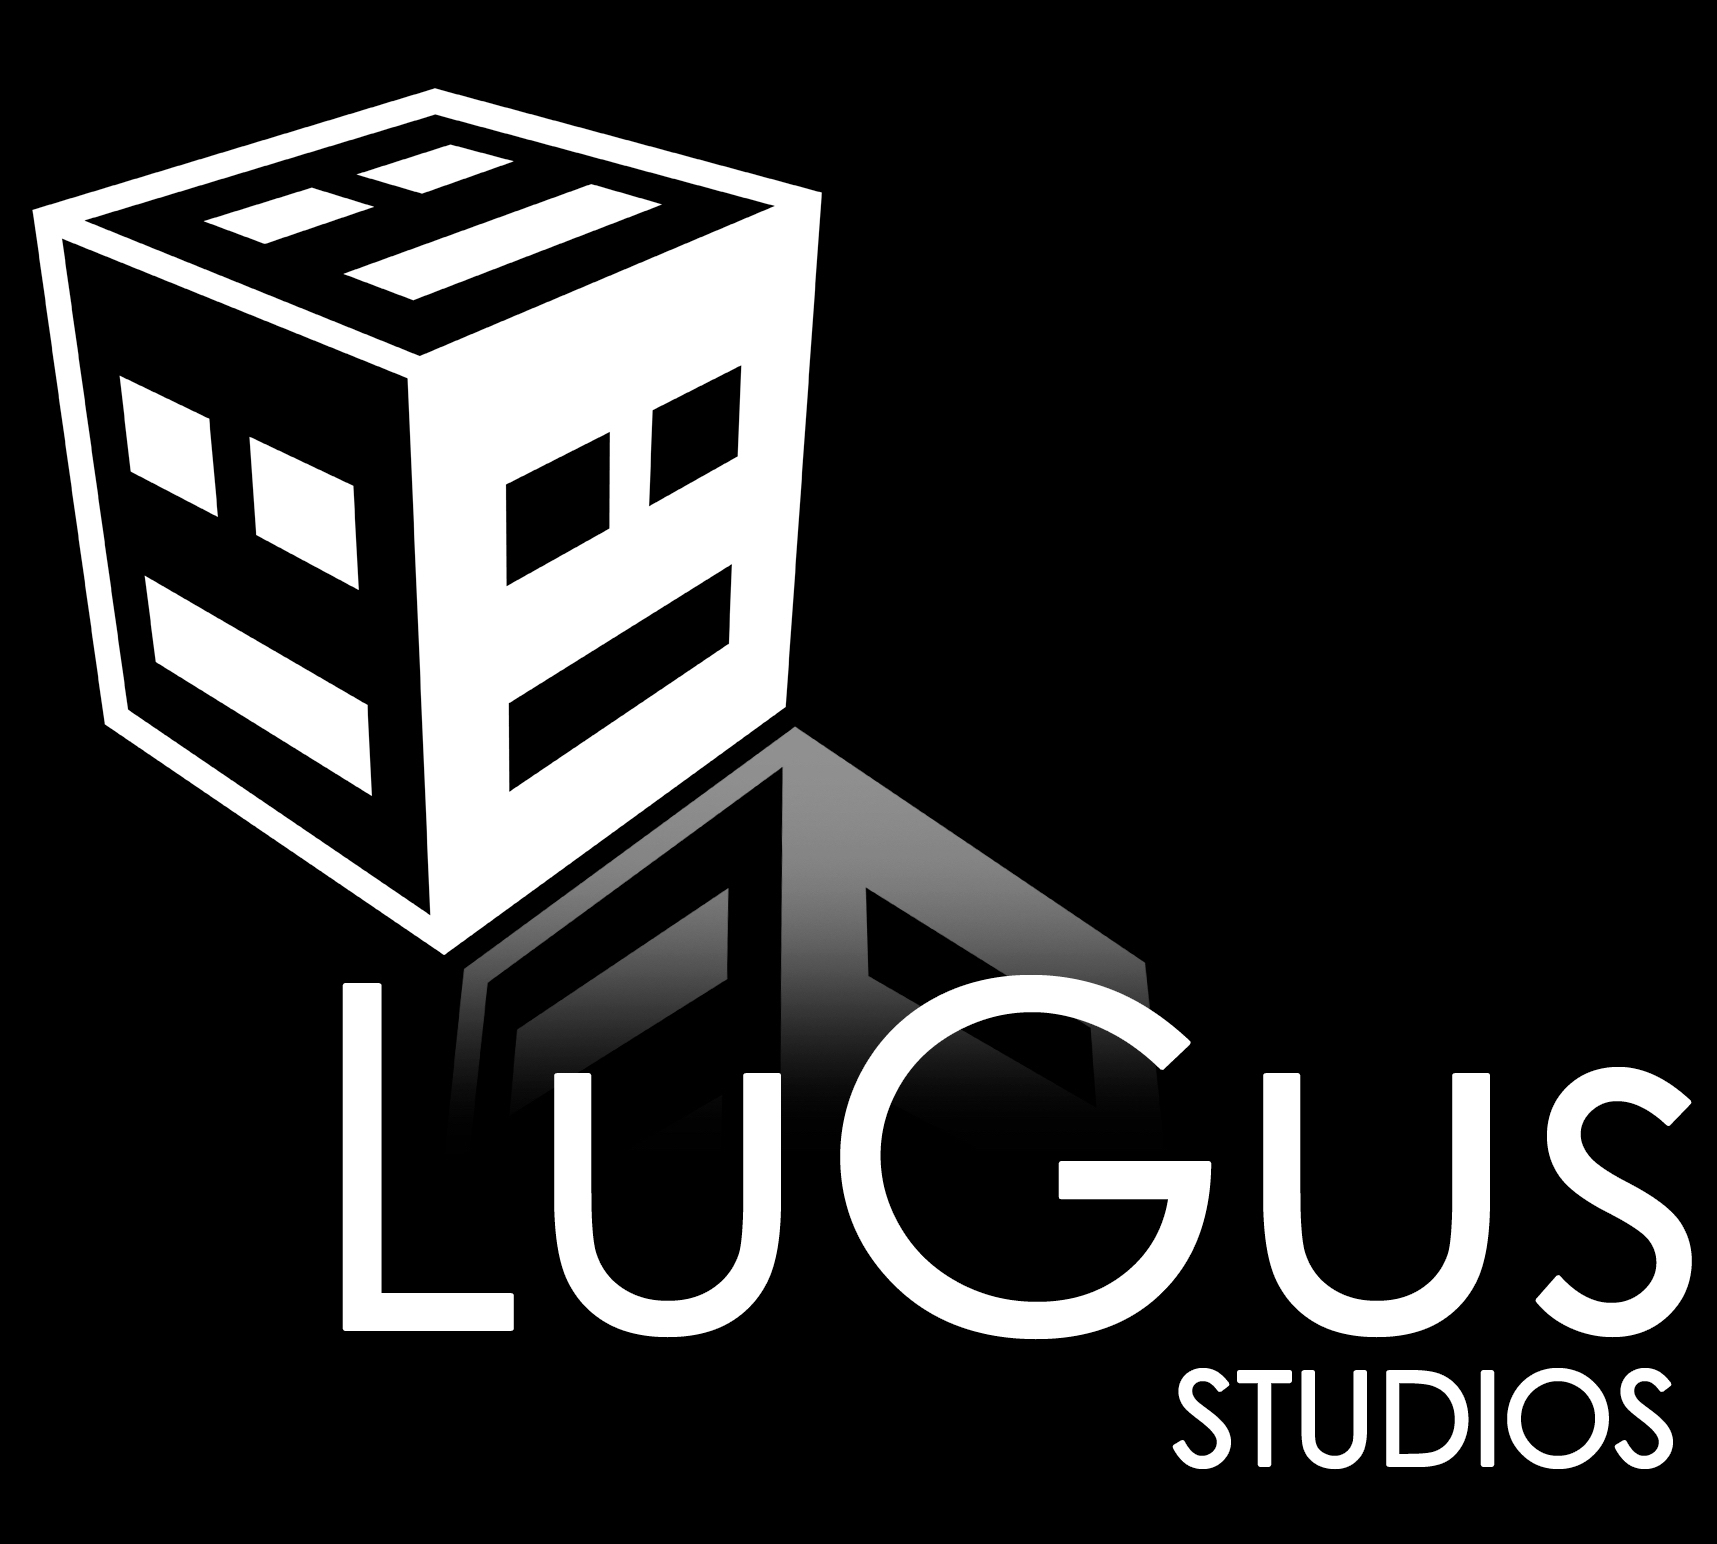 lugus-studios-logo.jpg